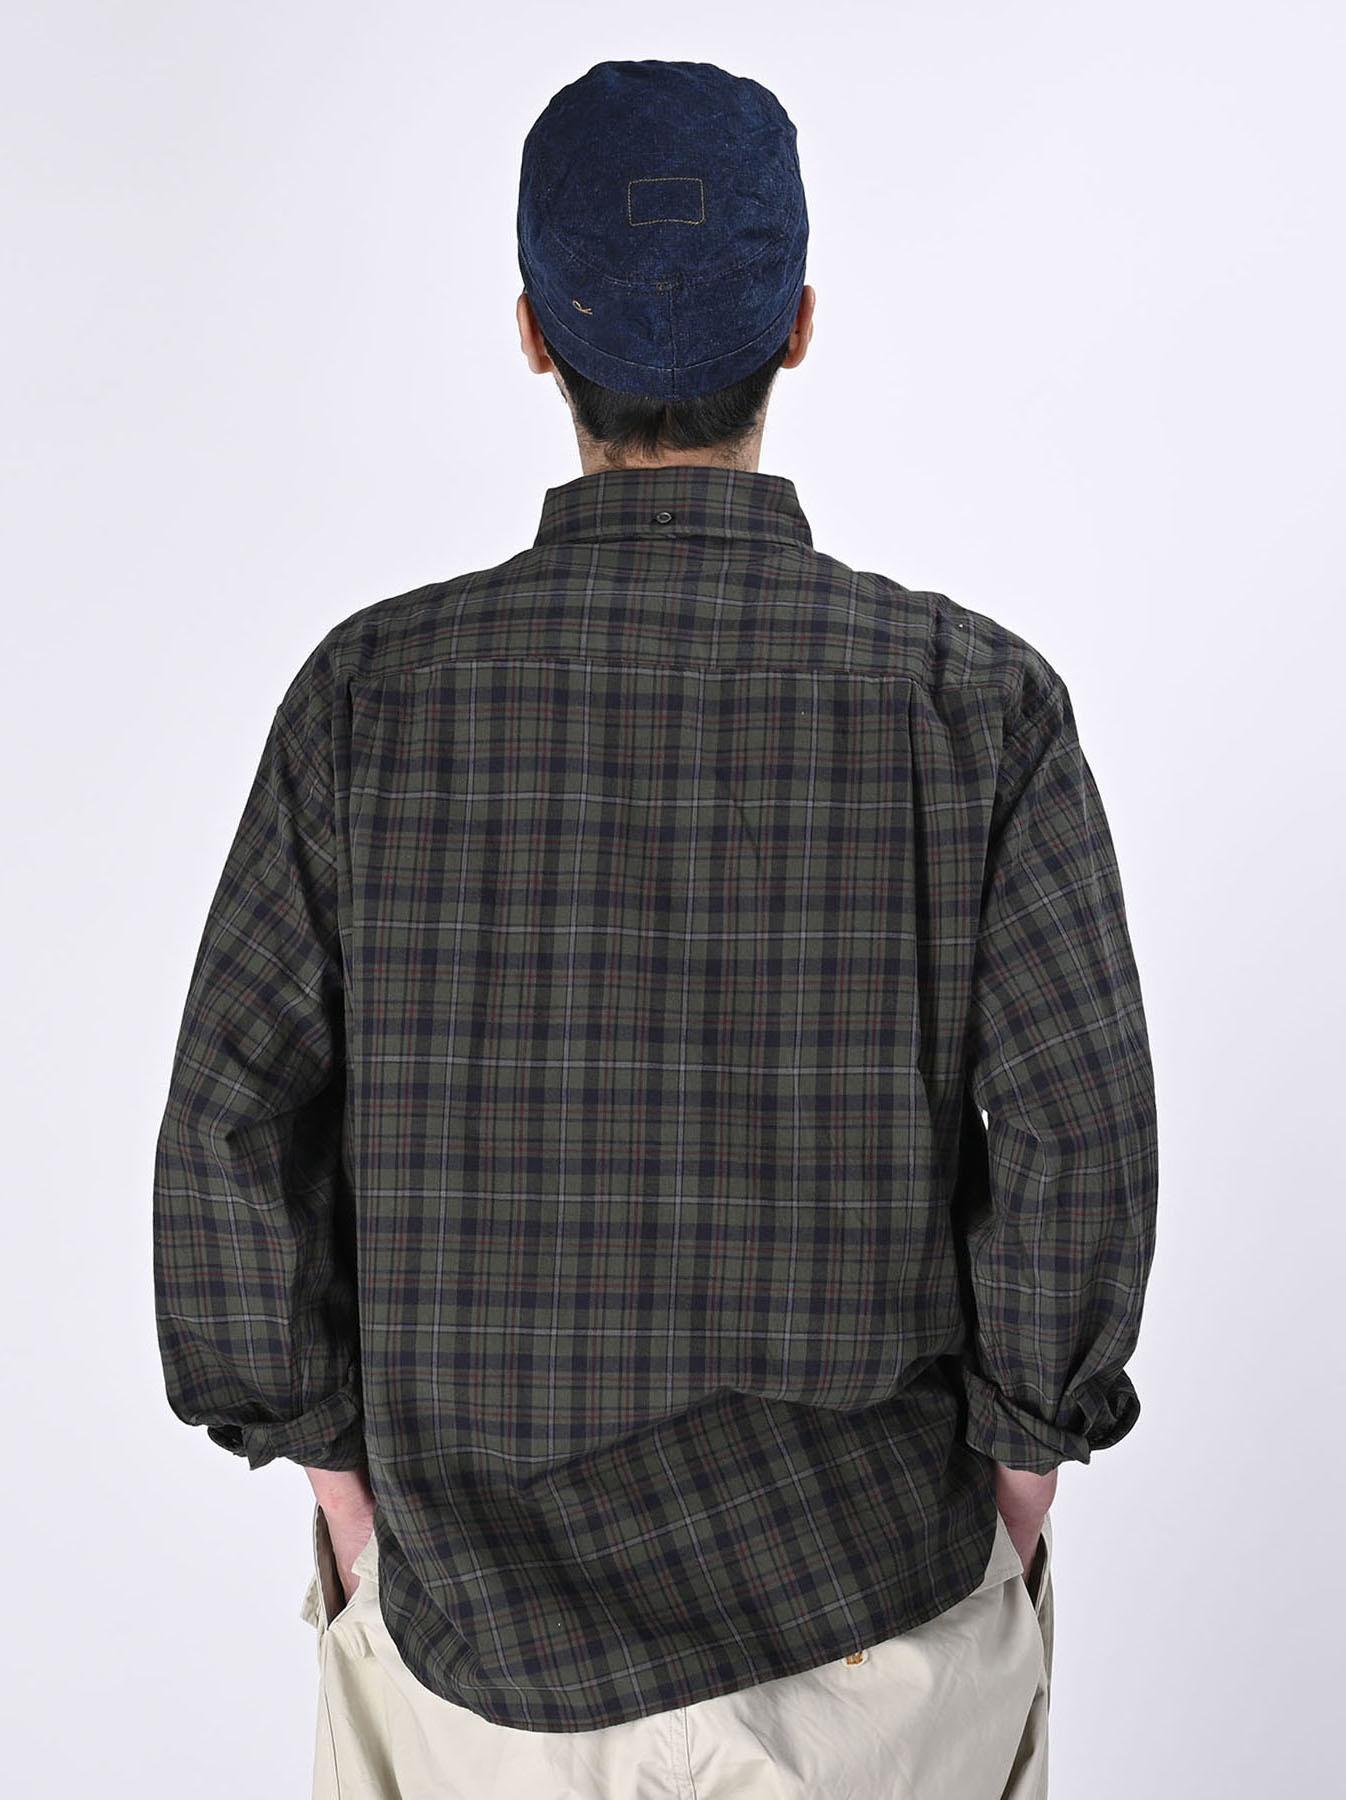 Indian Mugi-hira 908 Ocean Button Down Shirt (0421)-6